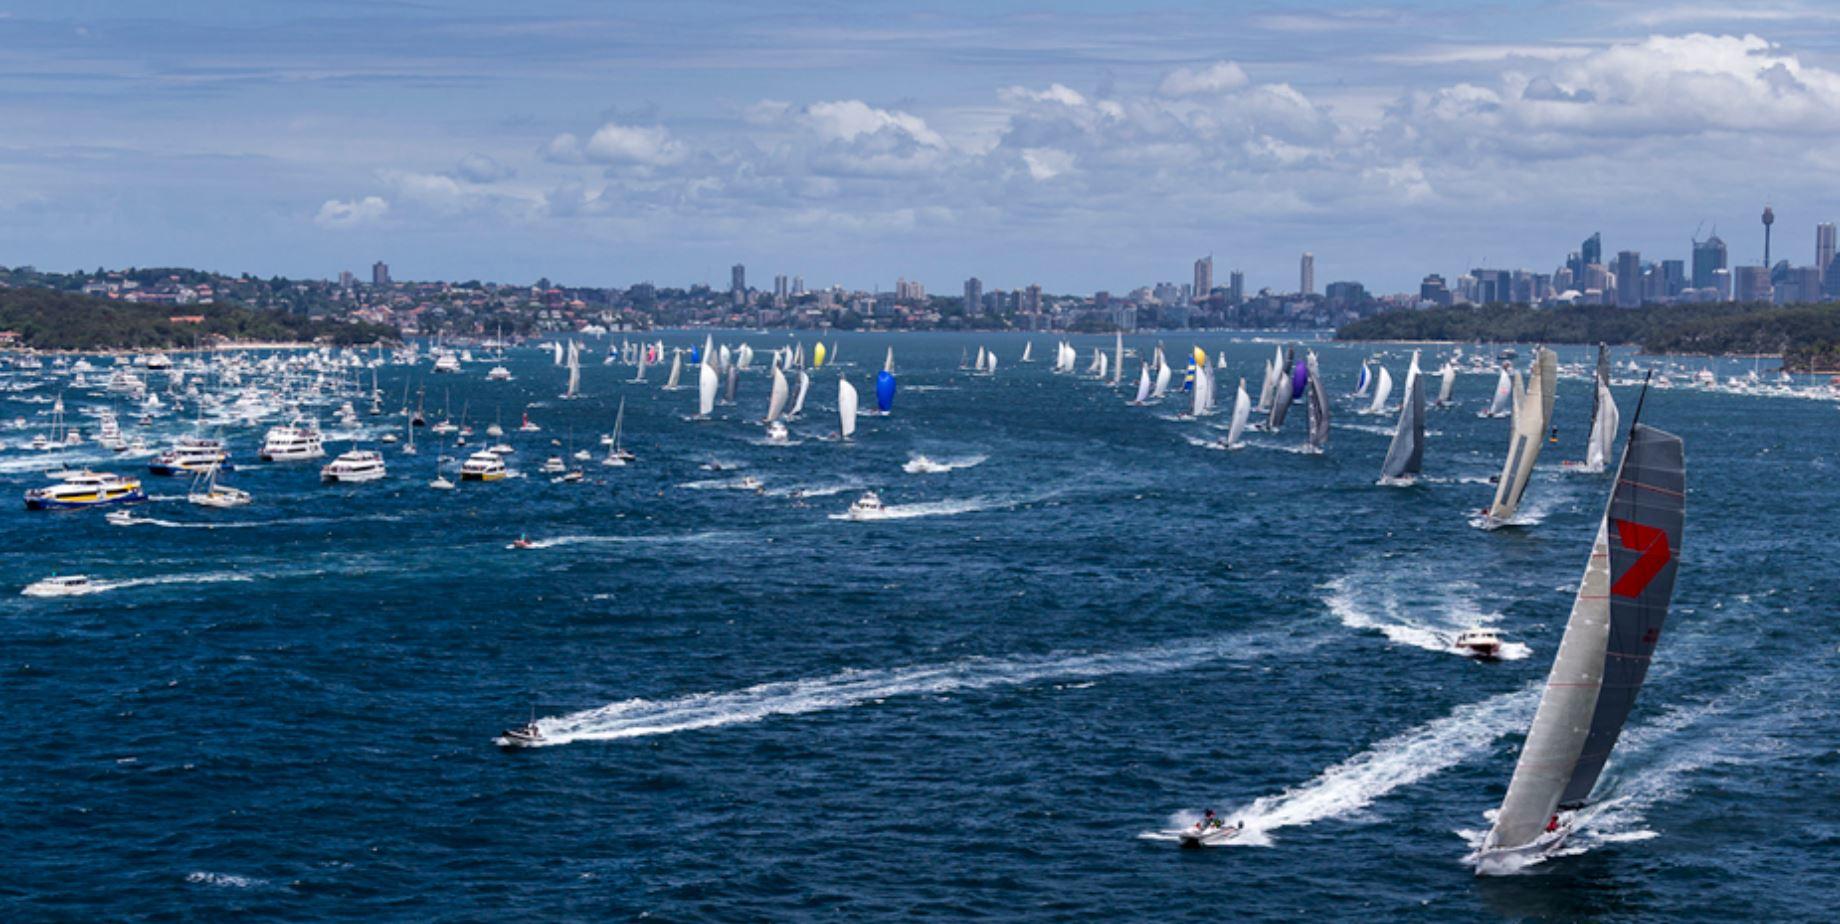 Photo credit: Cruising Yacht Club of Australia